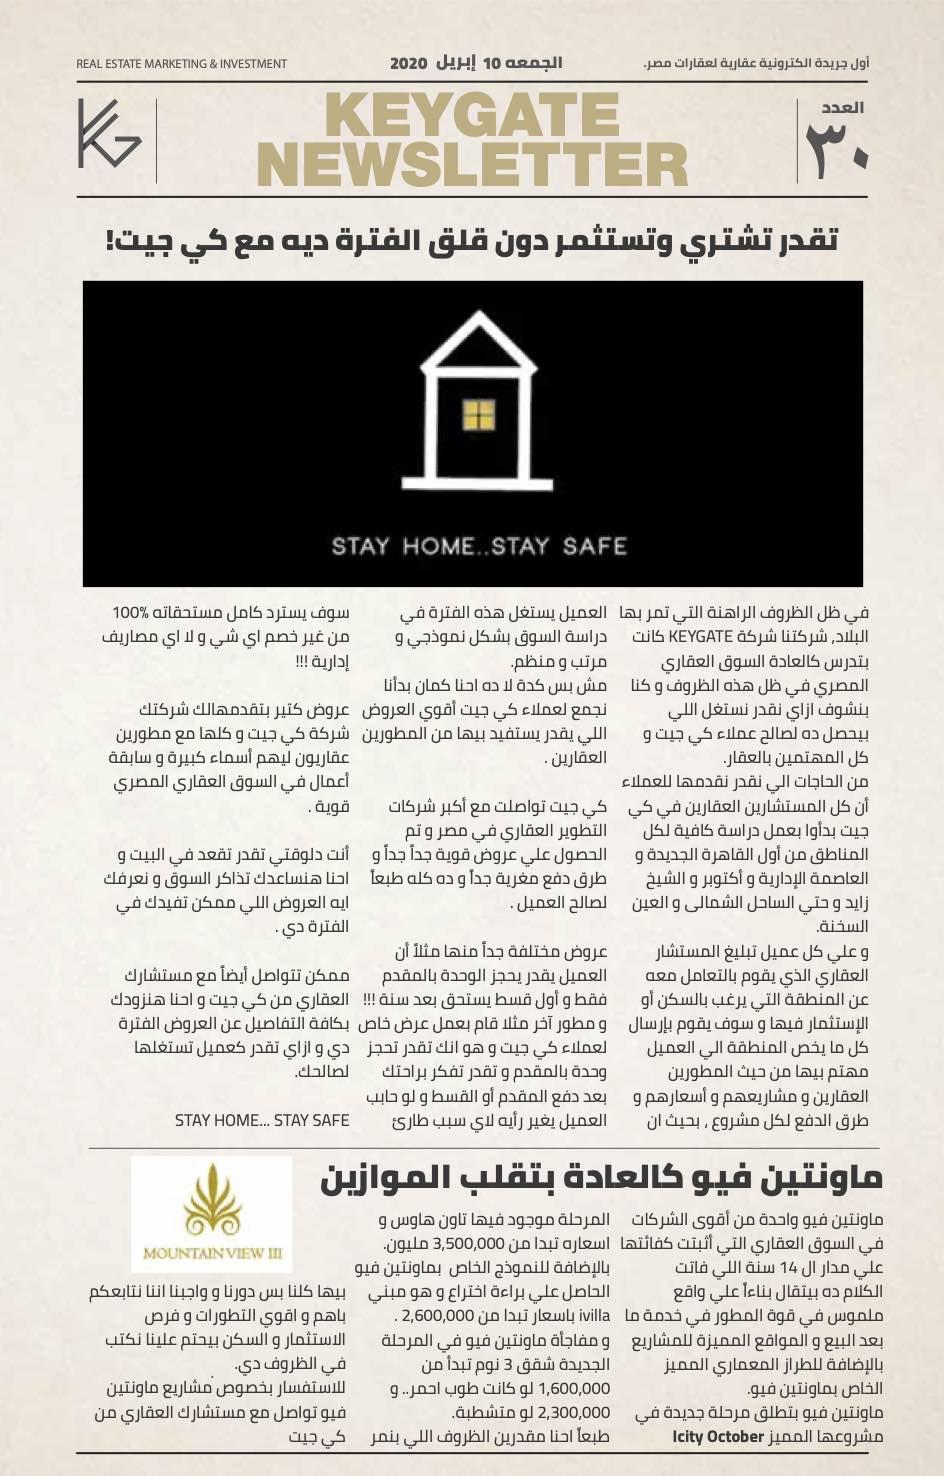 KeyGate Real Estate' Newspaper 10:4:2020 1.0